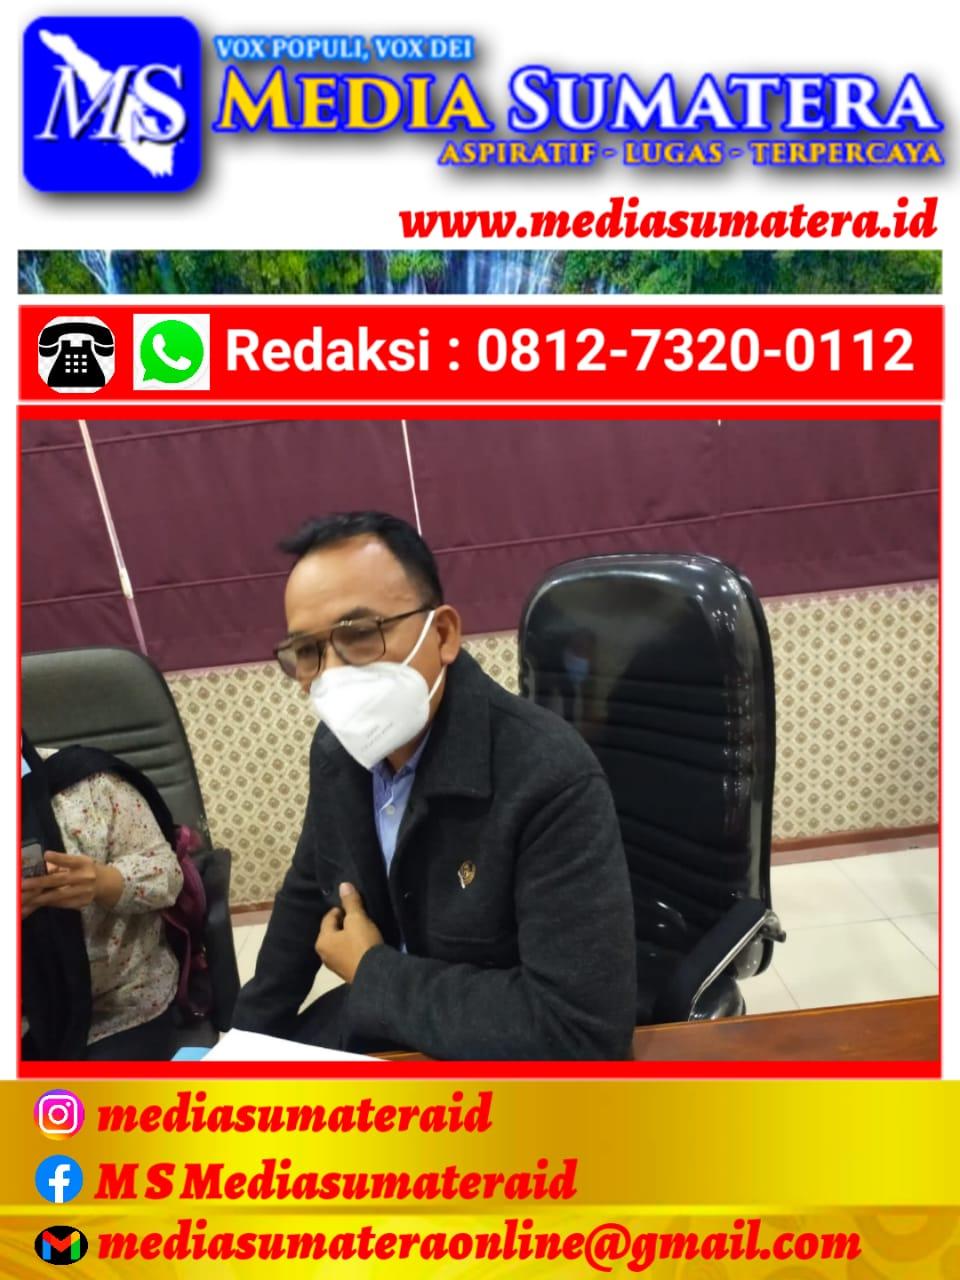 Ketua DPRD Sumsel Hj R.A Anita Noeringhati SH, MH., Support Rencana Pembangunan Kampus IPDN Sumatera Selatan